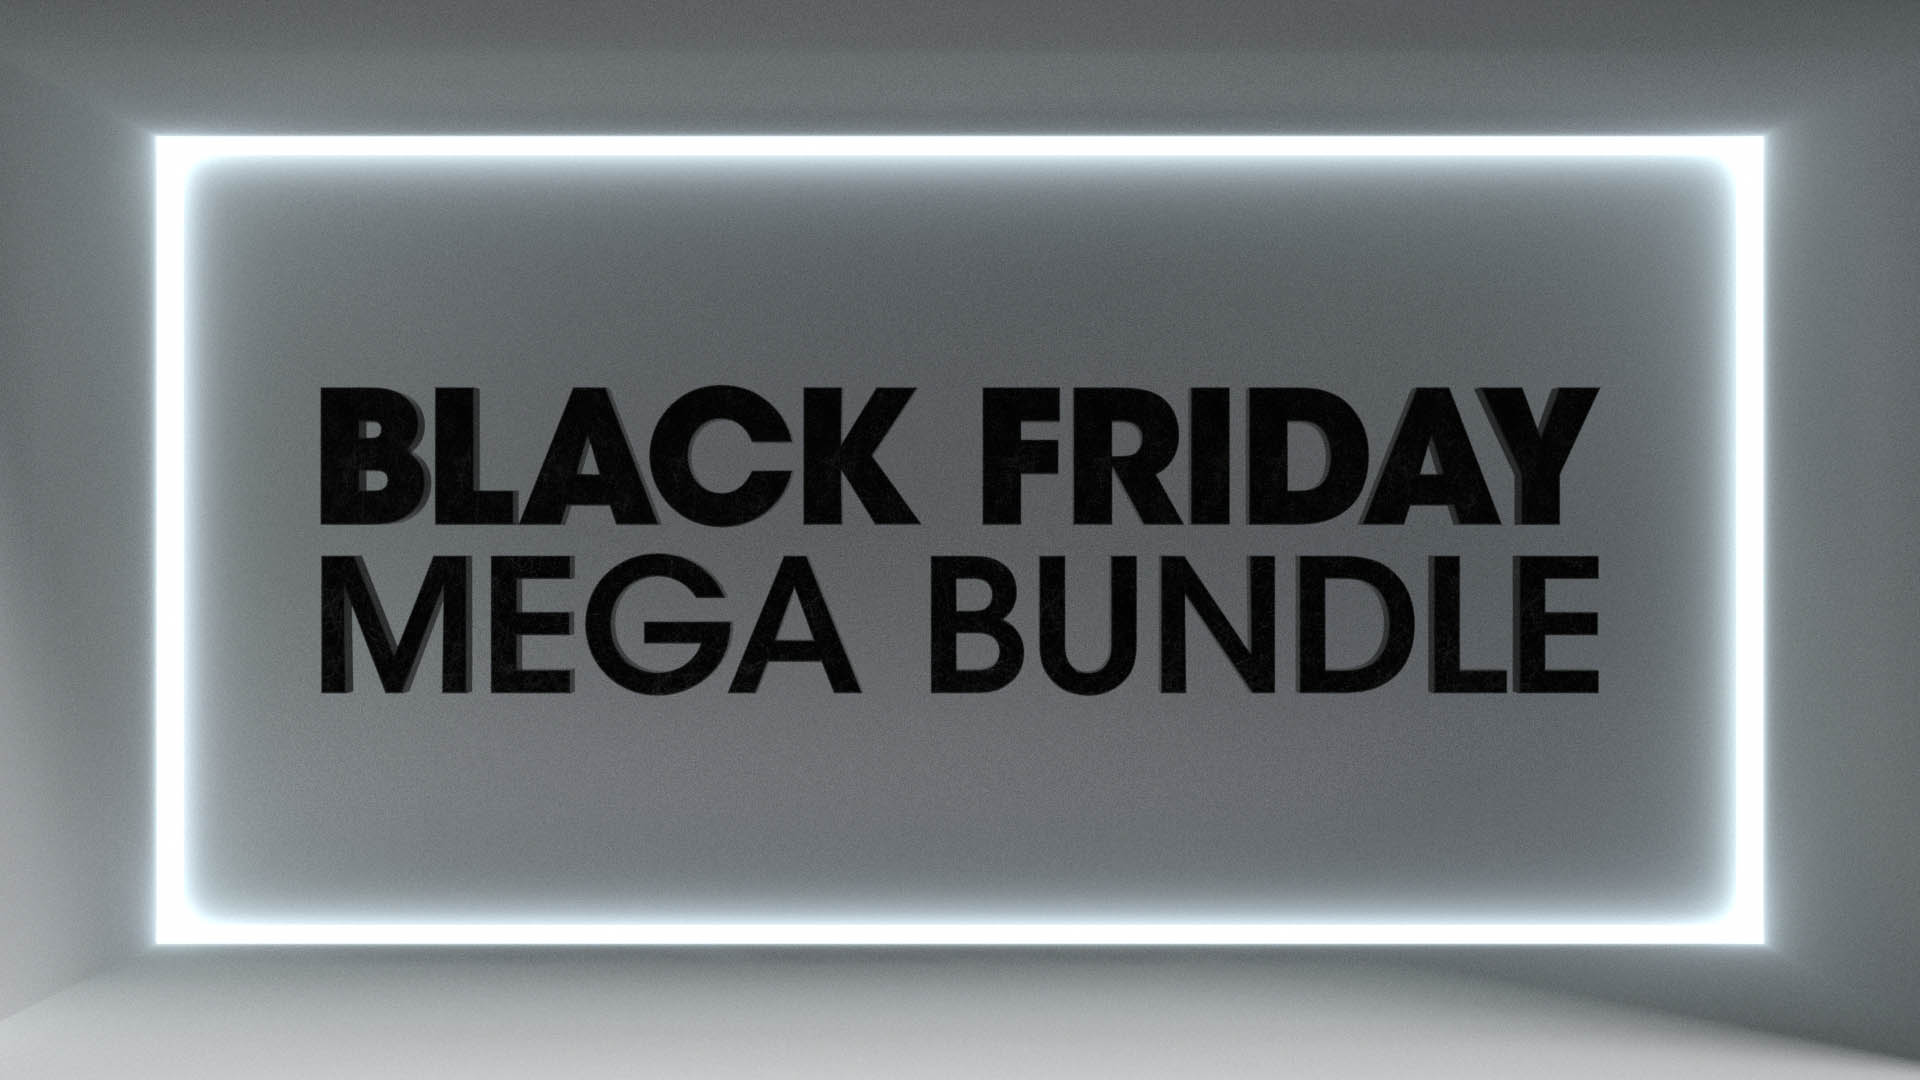 Black Friday Mega Bundle by Ghosteam